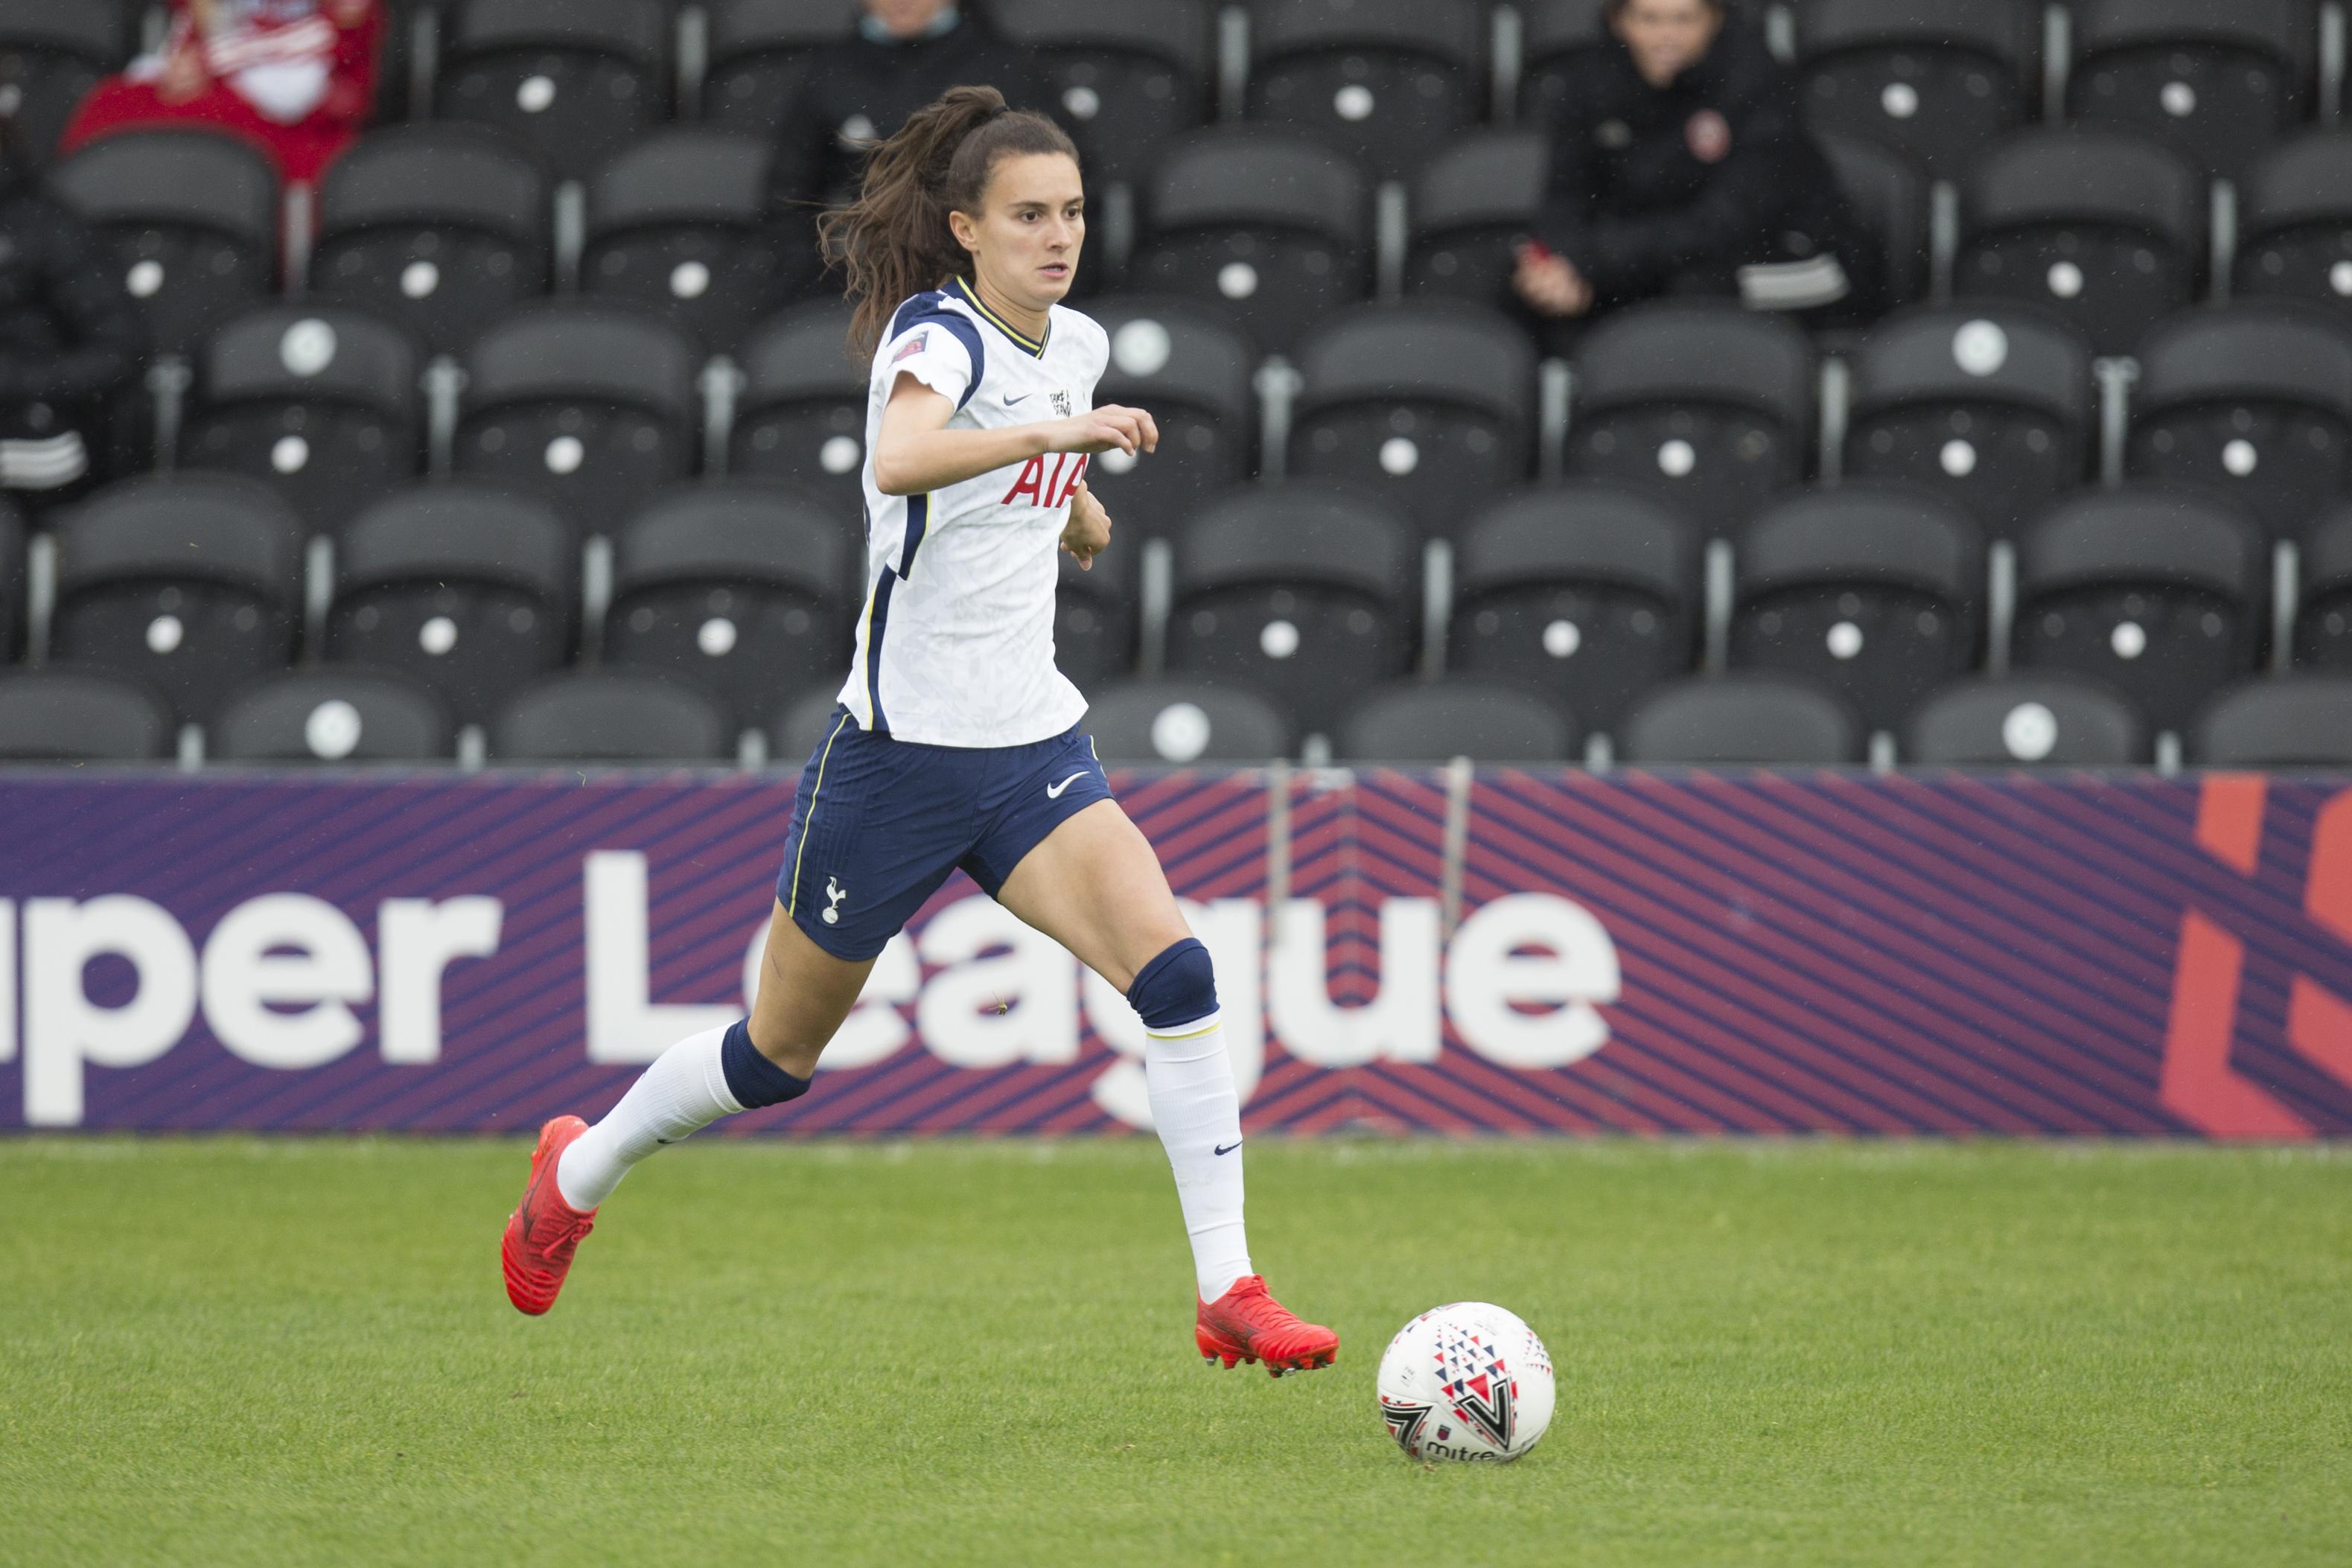 Tottenham Hotspur v Sheffield Utd: Vitality Women's FA Cup Fifth Round